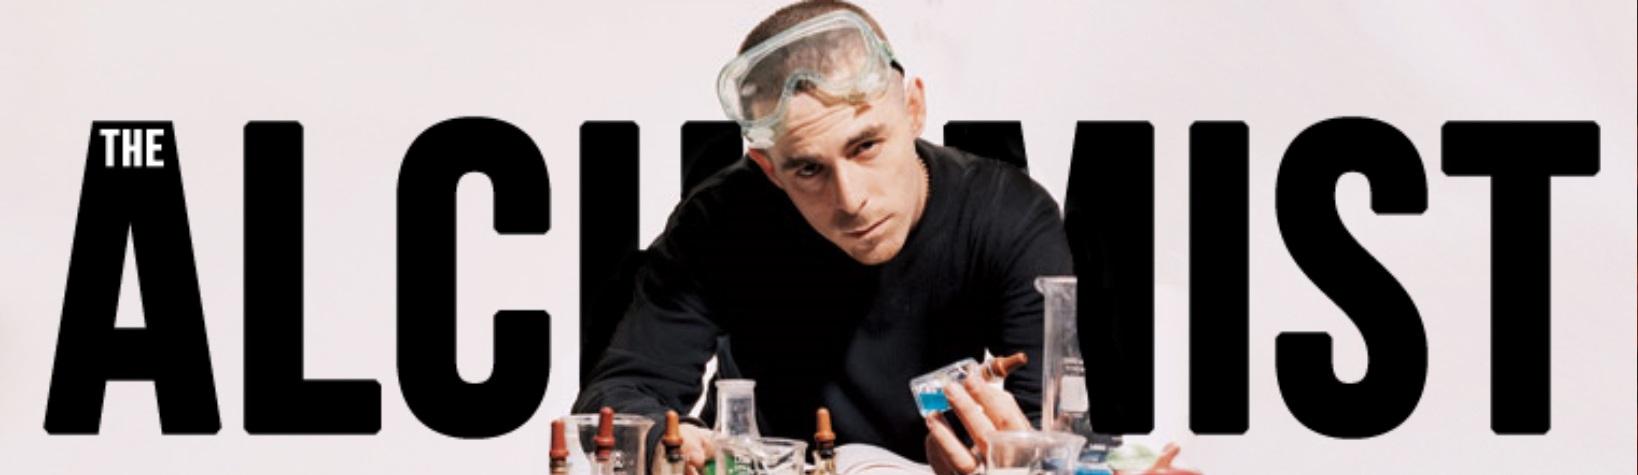 DJ Alchemist booking, book DJ Alchemist for live shows, events, club